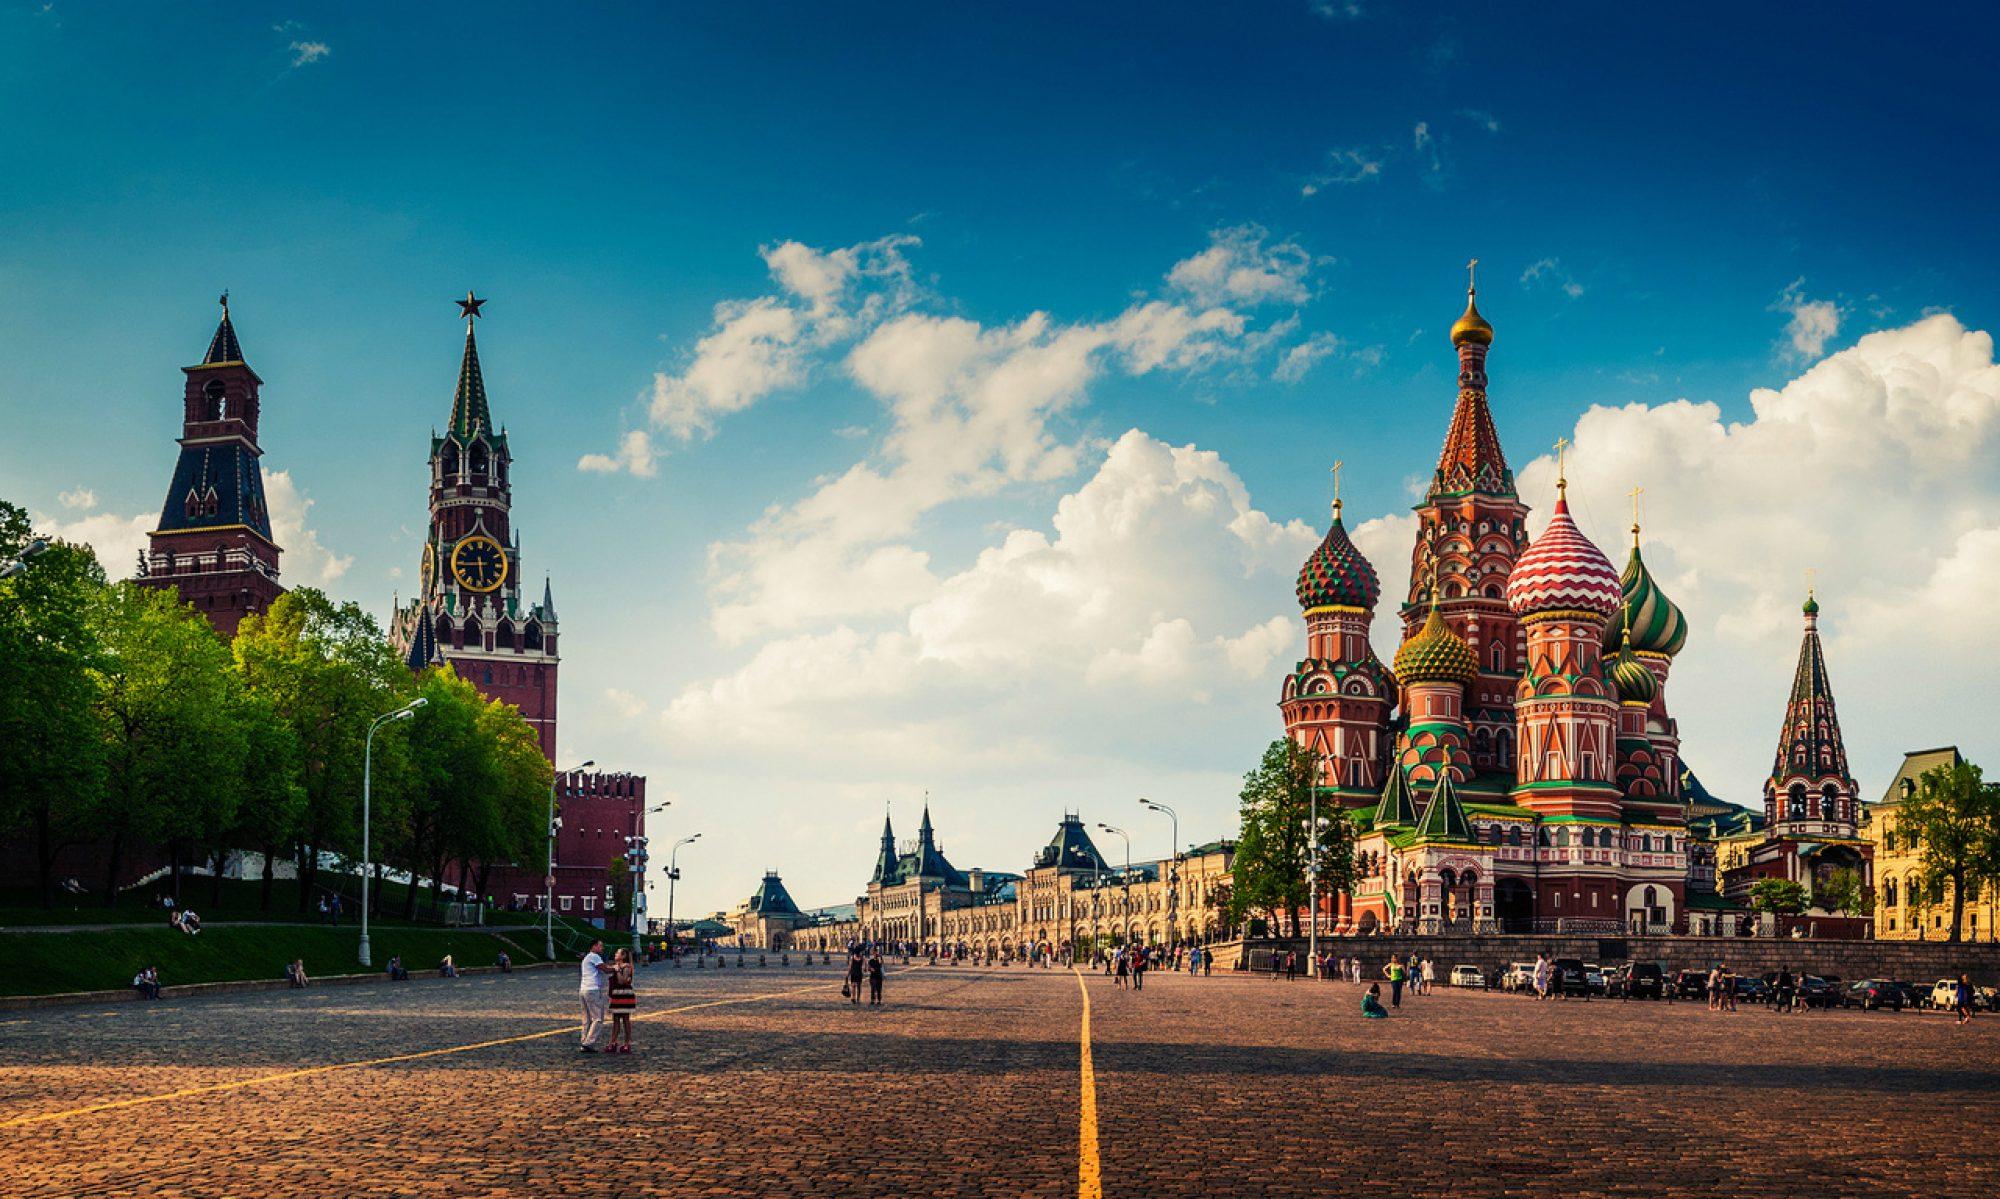 Rusya'da Üniversite Okumak